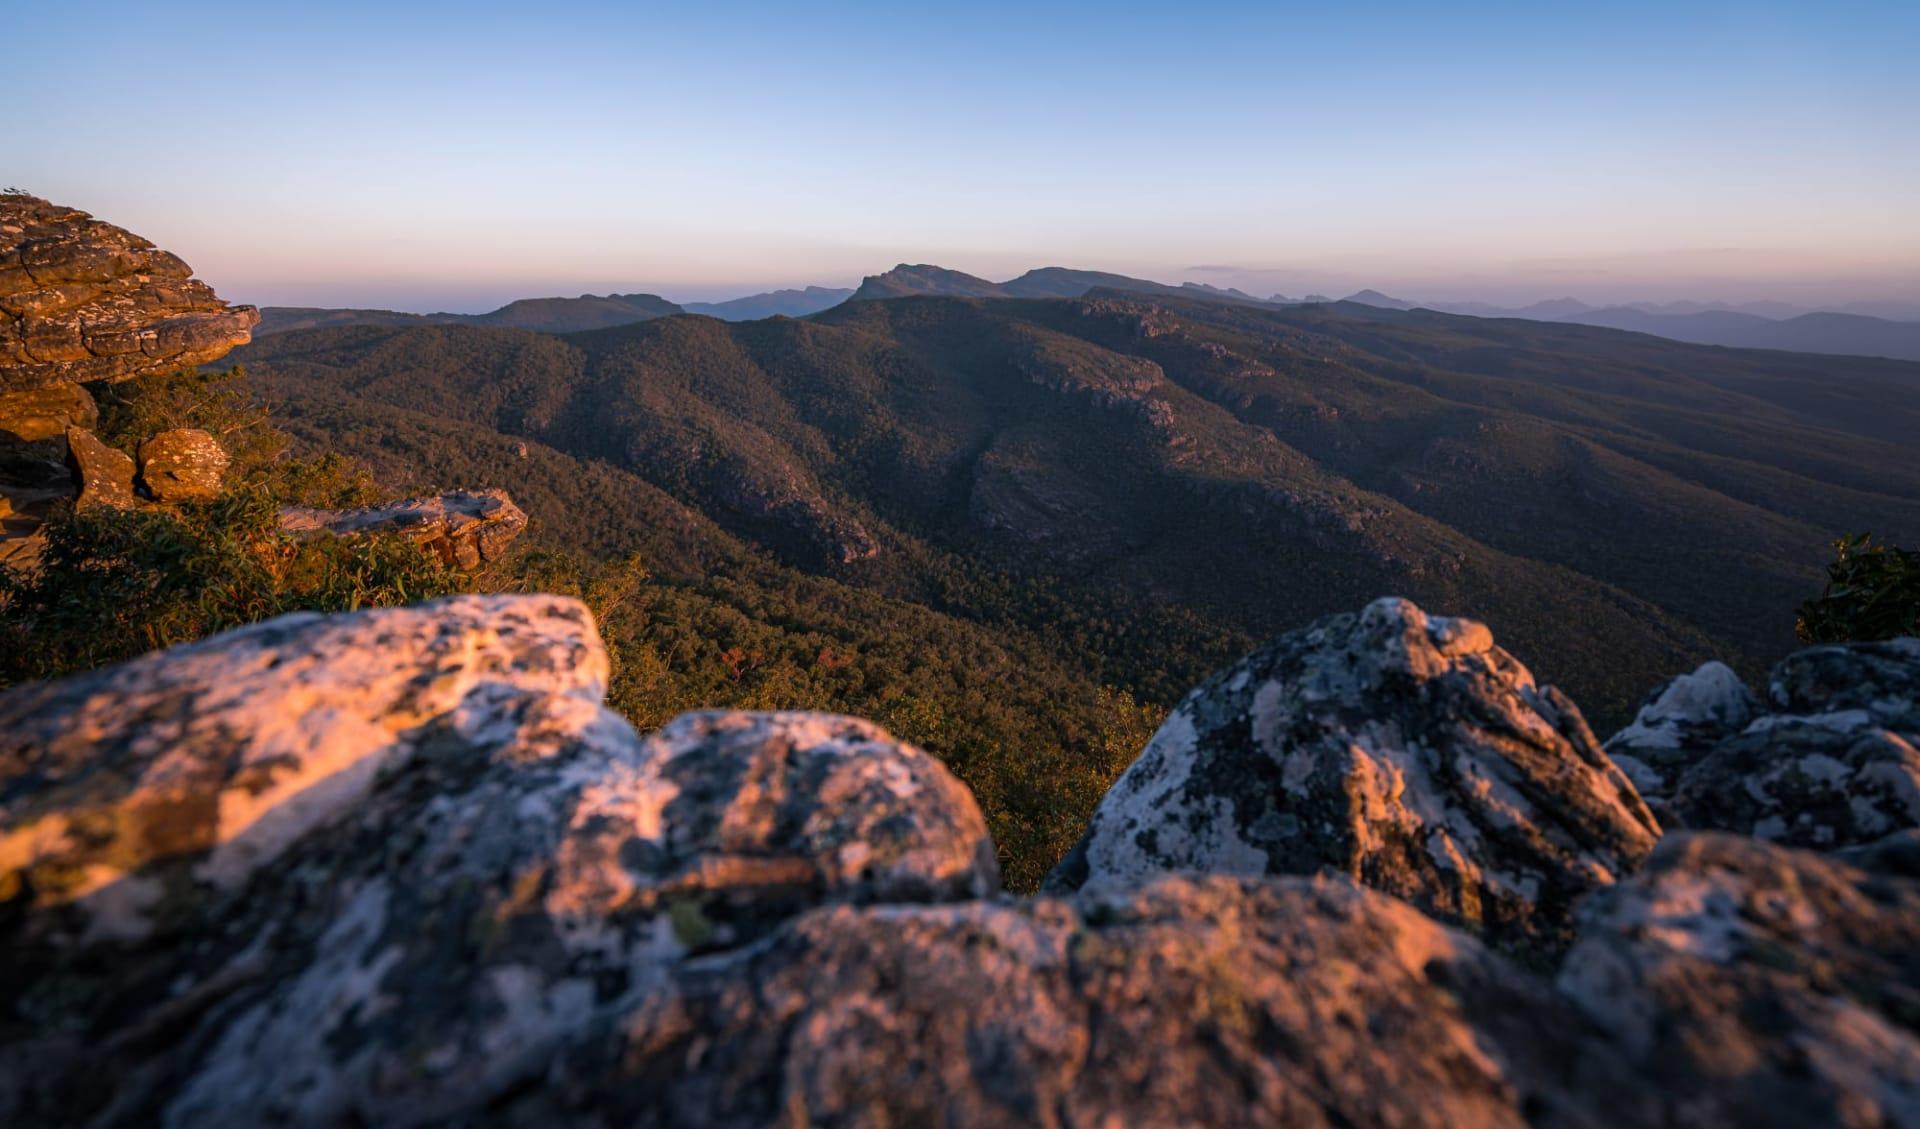 Melbourne to Darwin: Grampians National Park